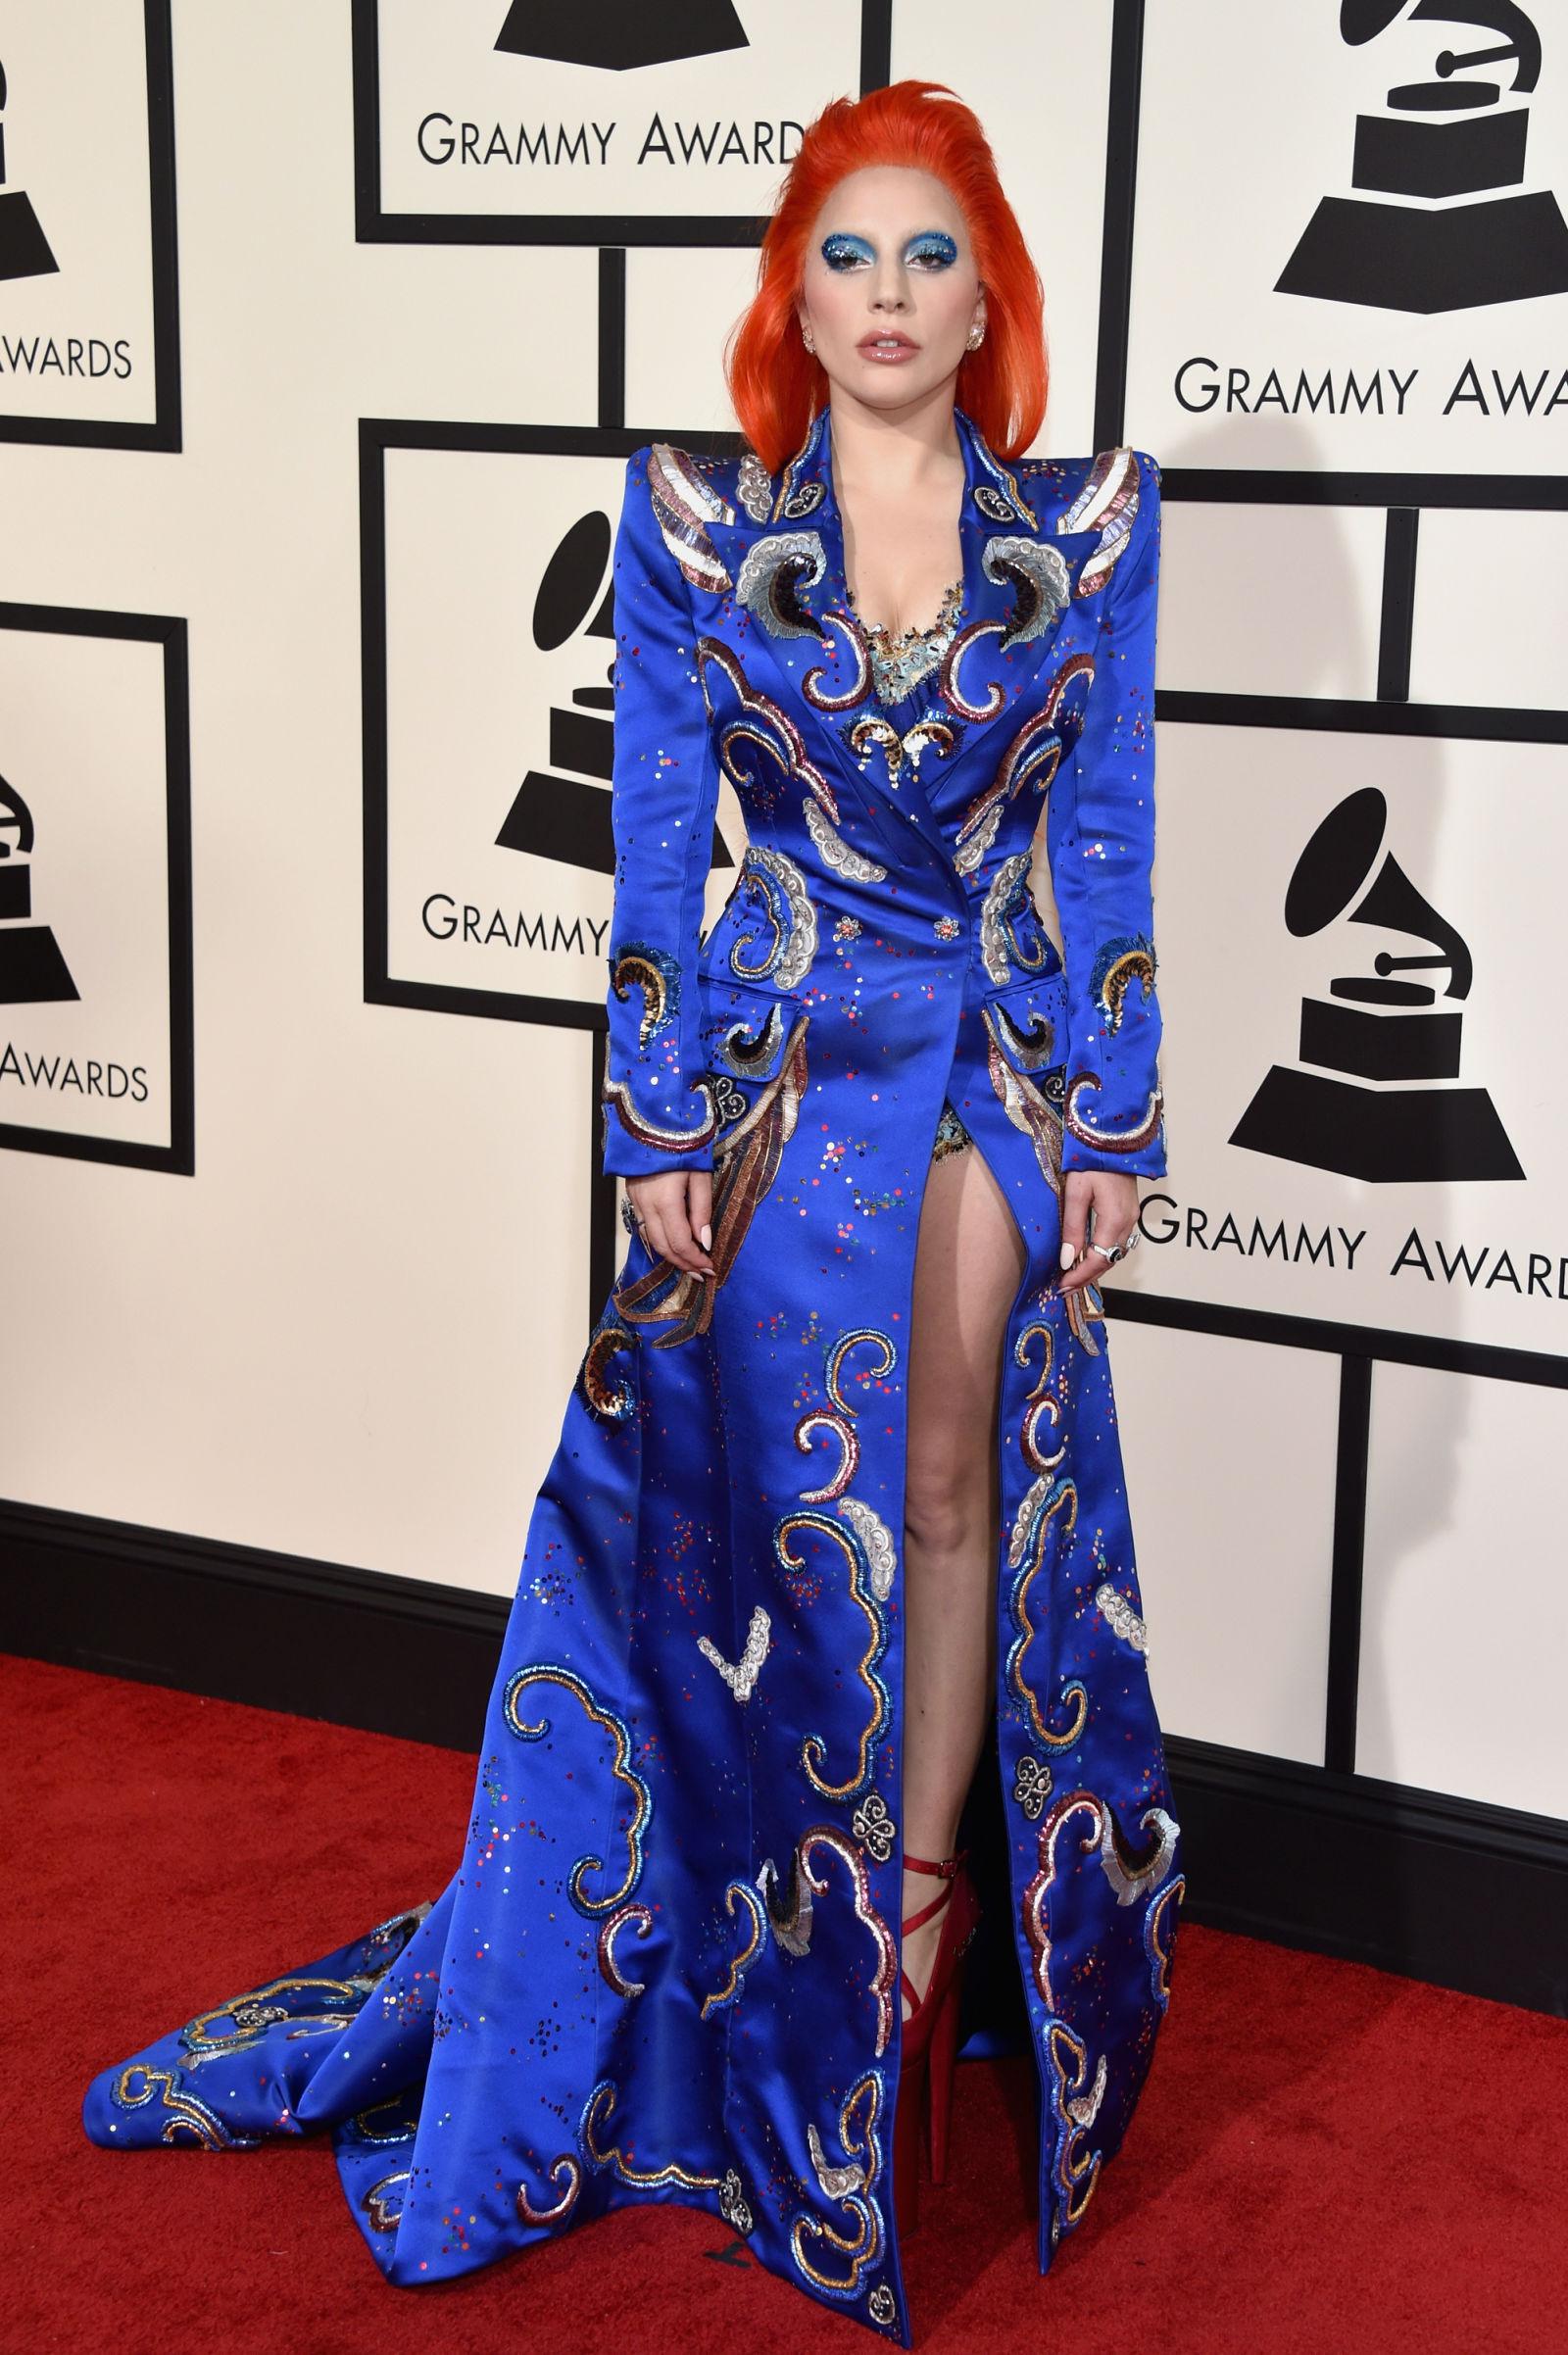 Lady Gaga celebrity hairstyles 2016 Grammys